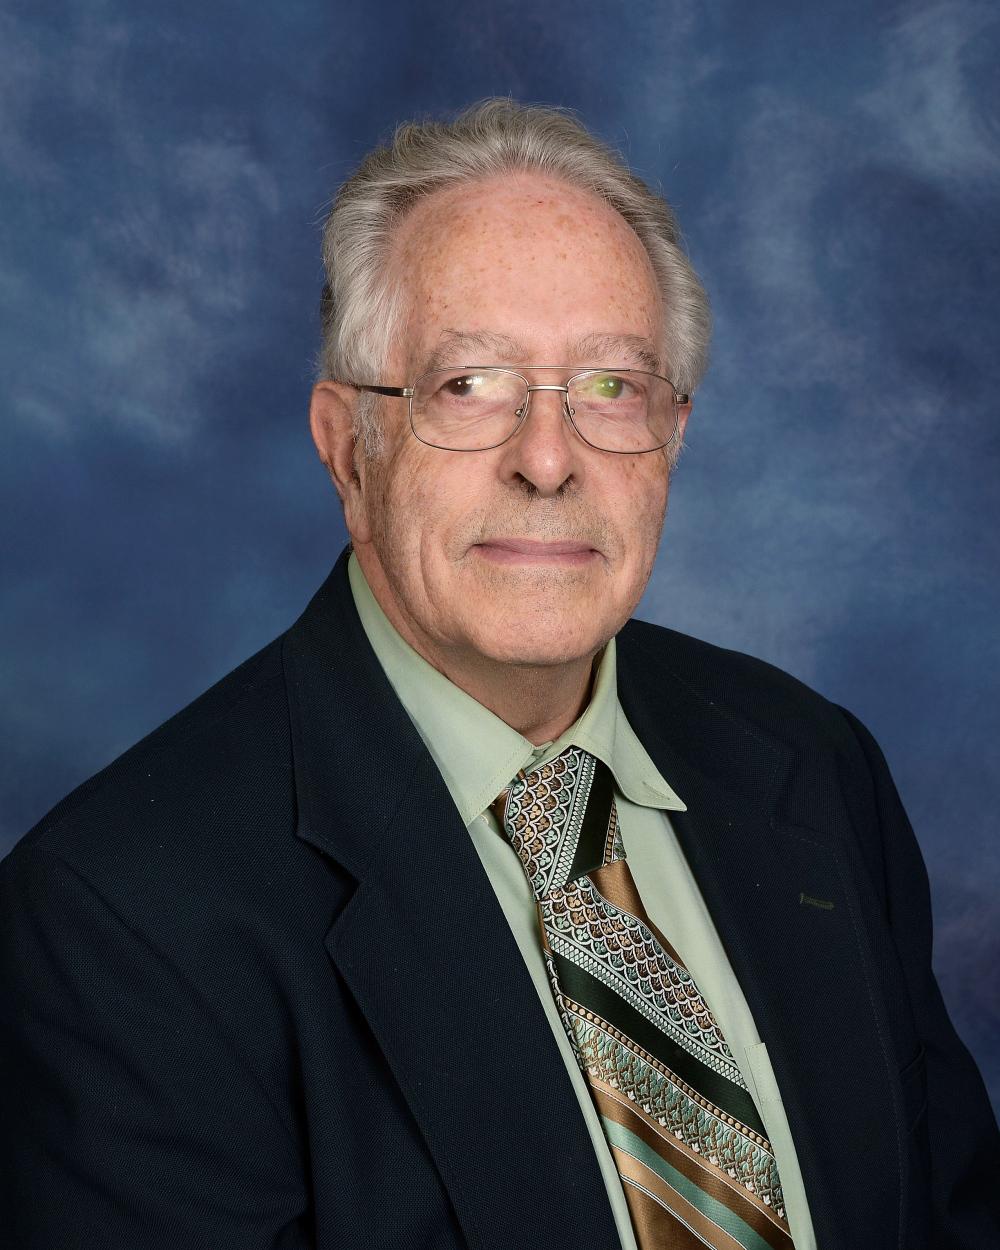 Charley Frank Matthaei, 84